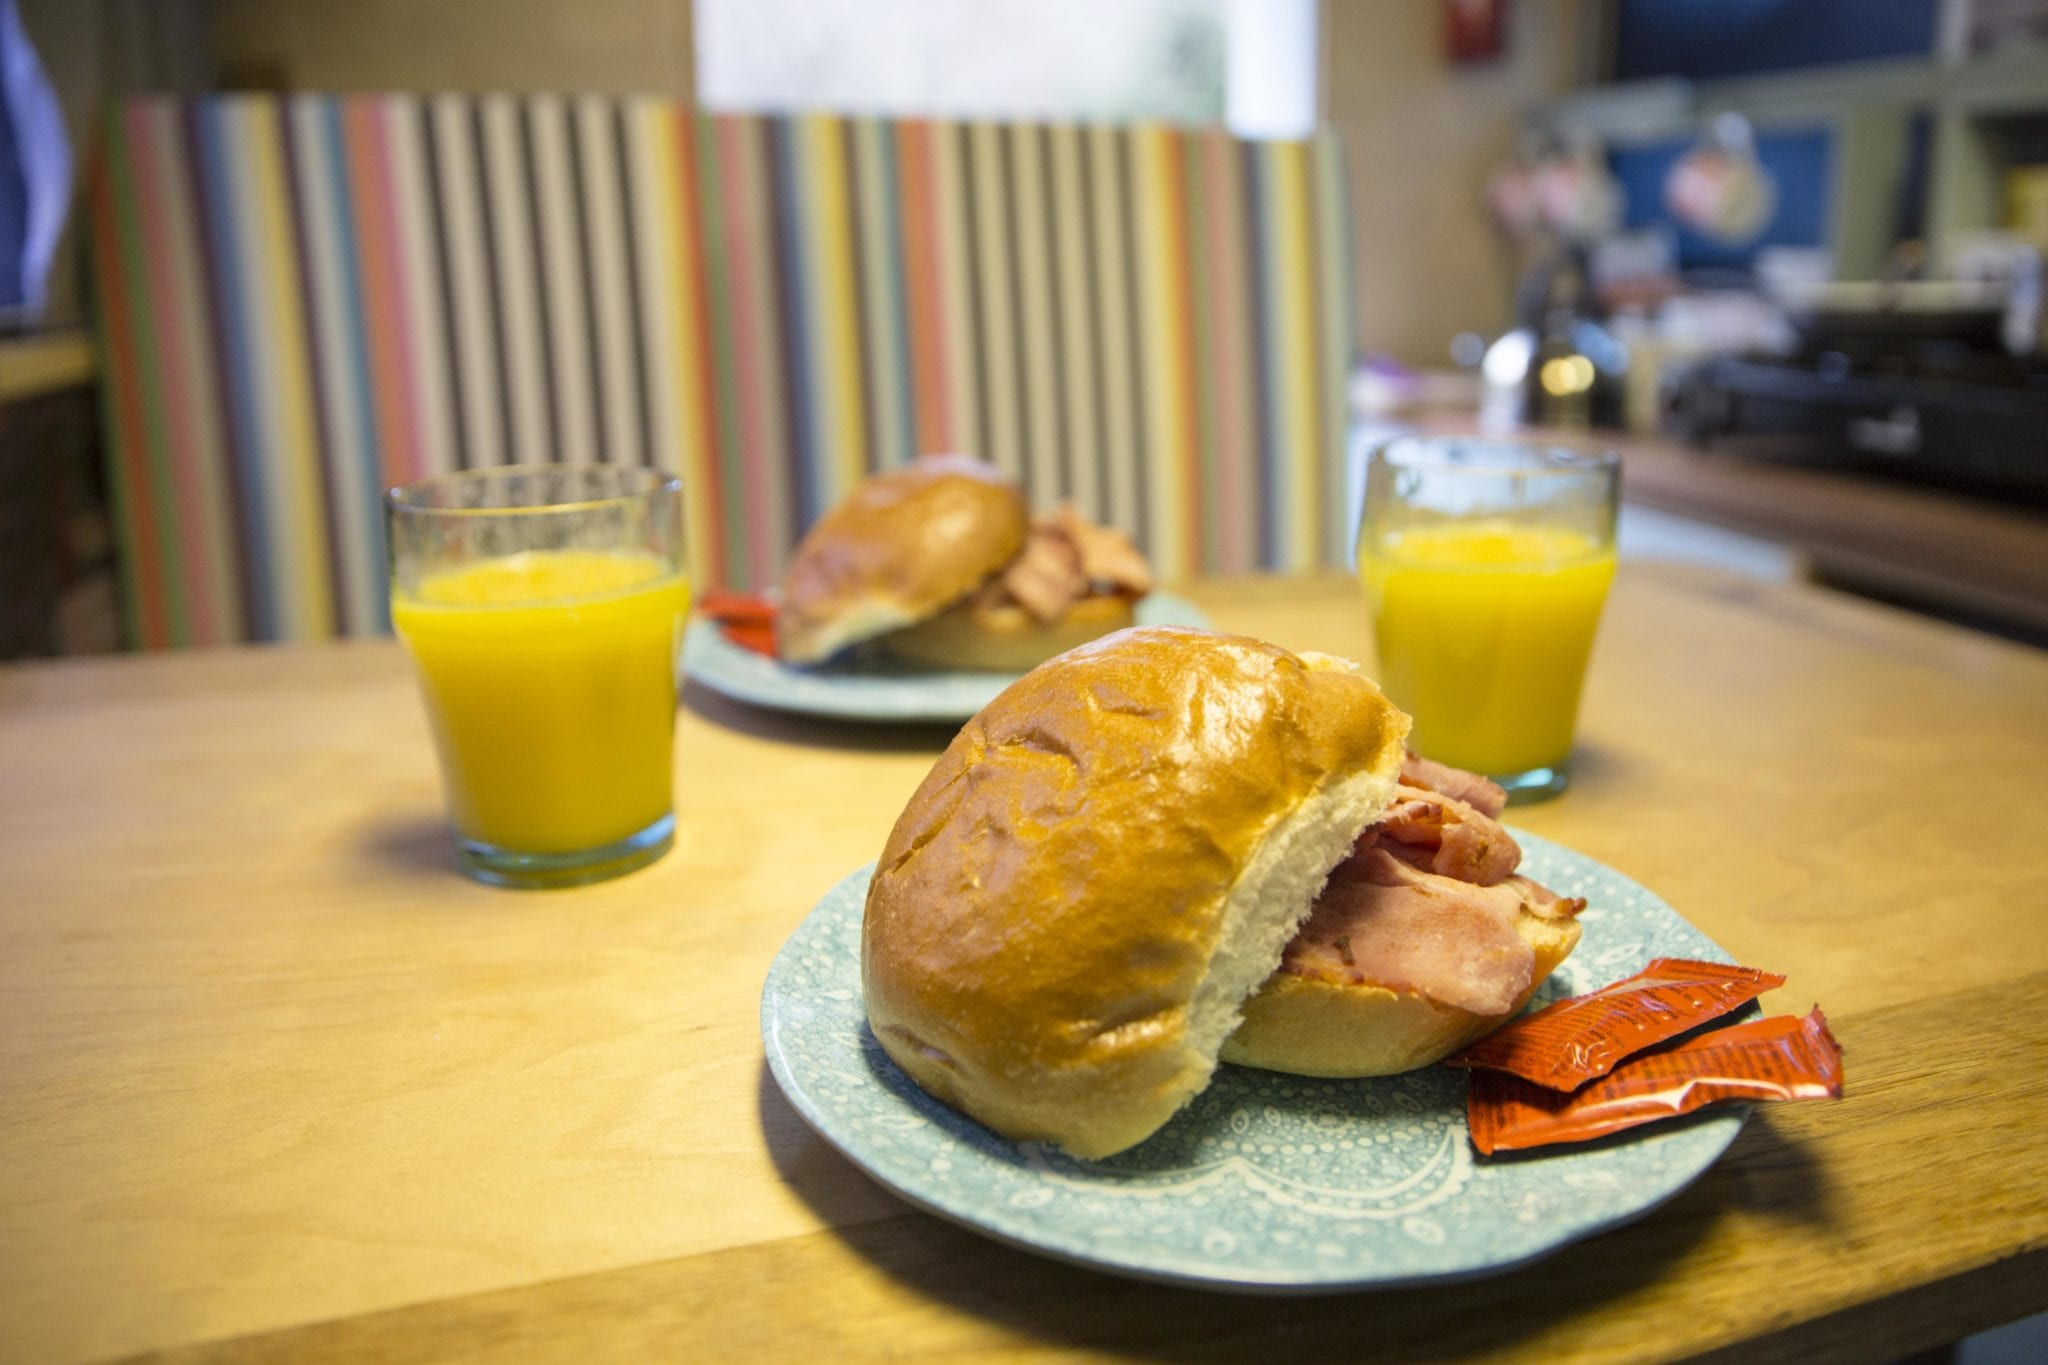 2 bacon bap and 2 glasses of orange juice